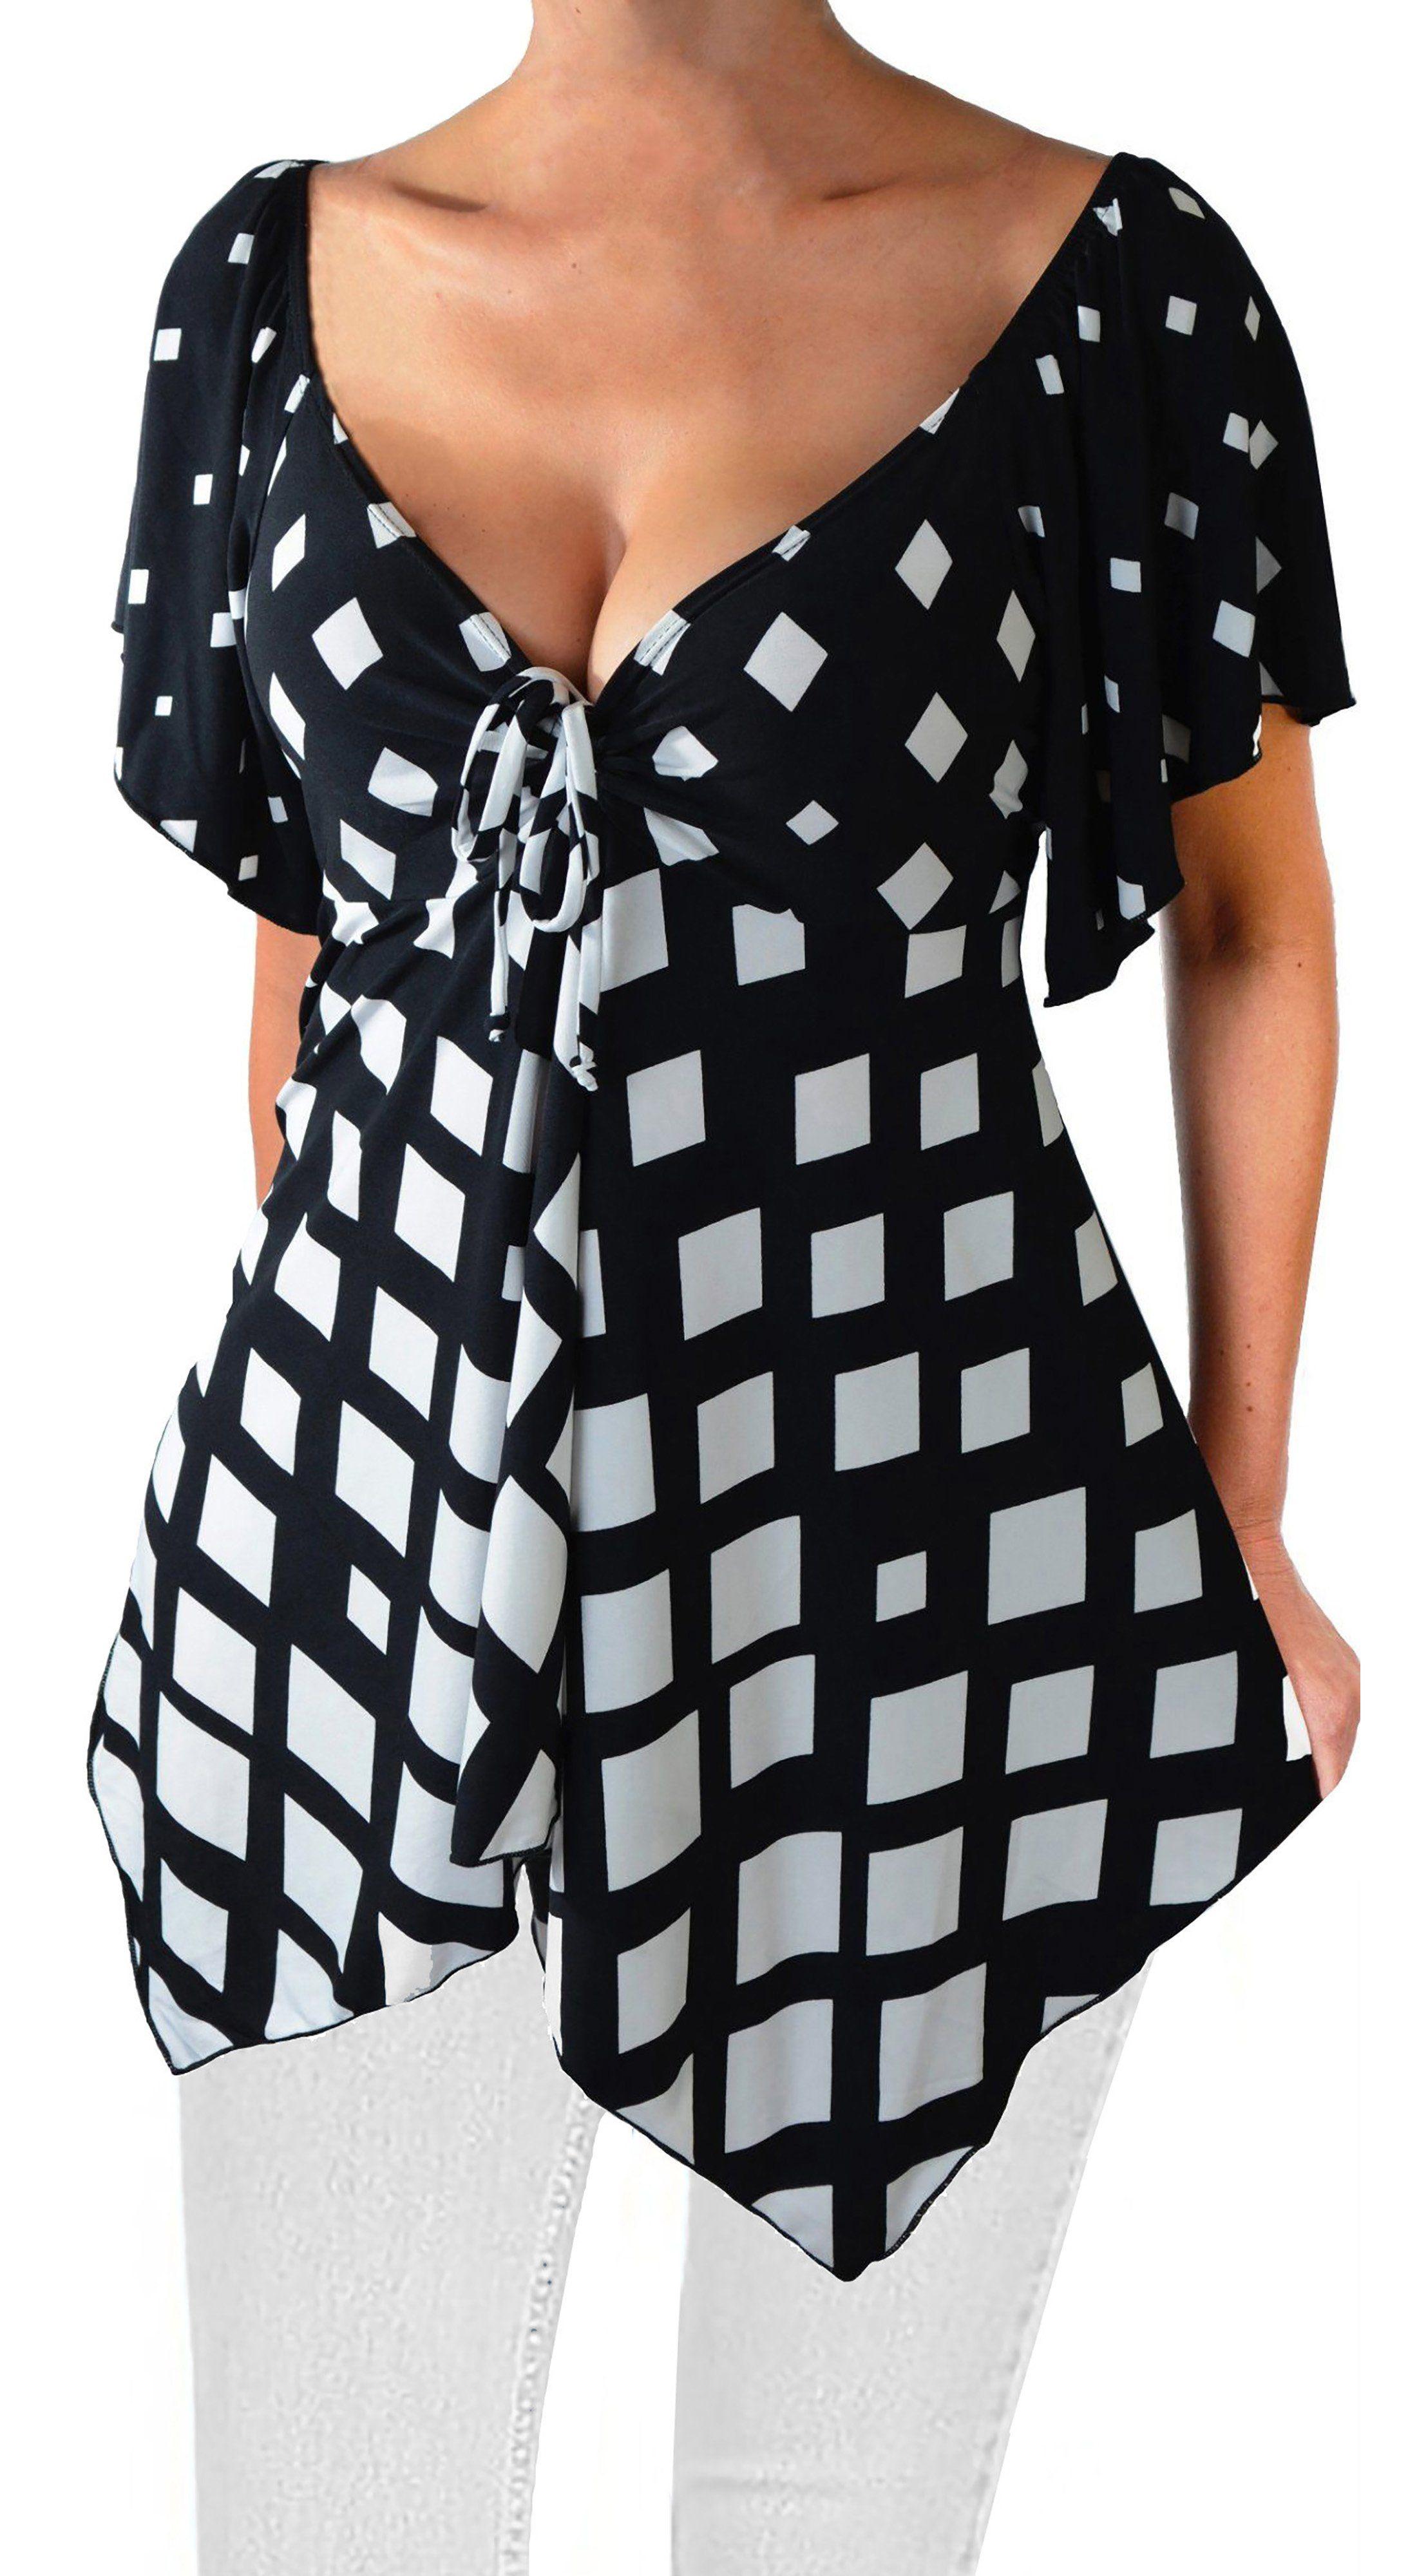 37b6234573e43f Funfash Plus Size Top Black White Diamond Empire Waist USA Blouse Shirt